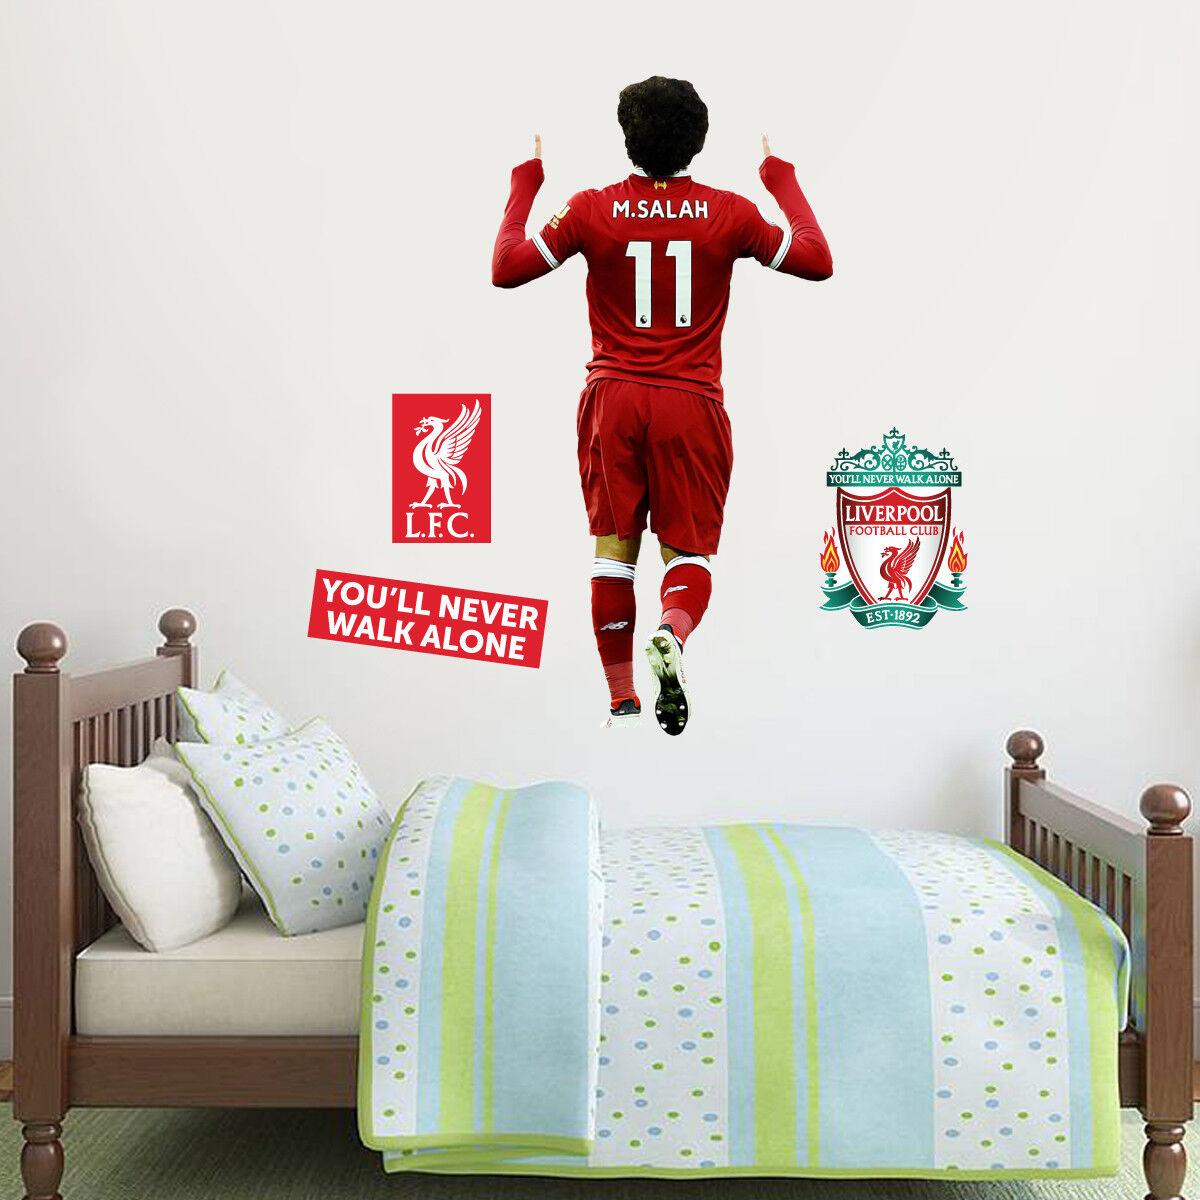 Mo Salah celebración Mural De Conjunto Pared + Conjunto De De Pared Adhesivo Calcomanía Liverpool LFC 549058